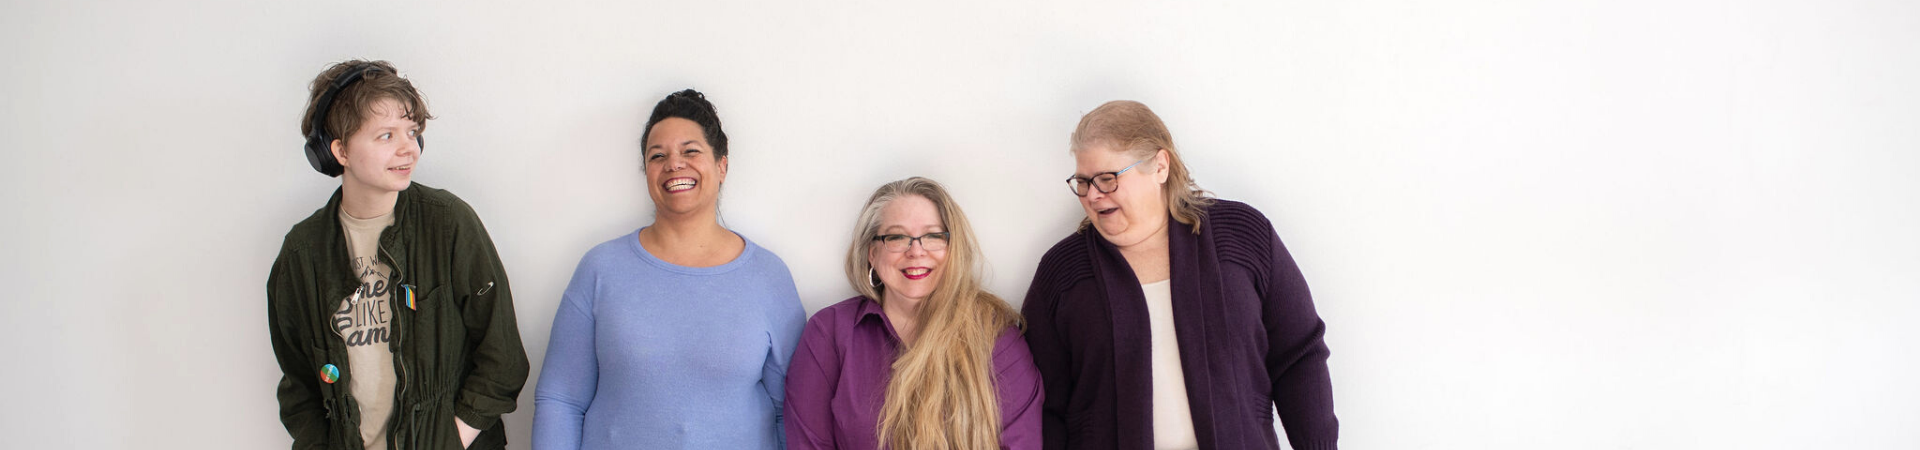 Meet the Back2Basics Team